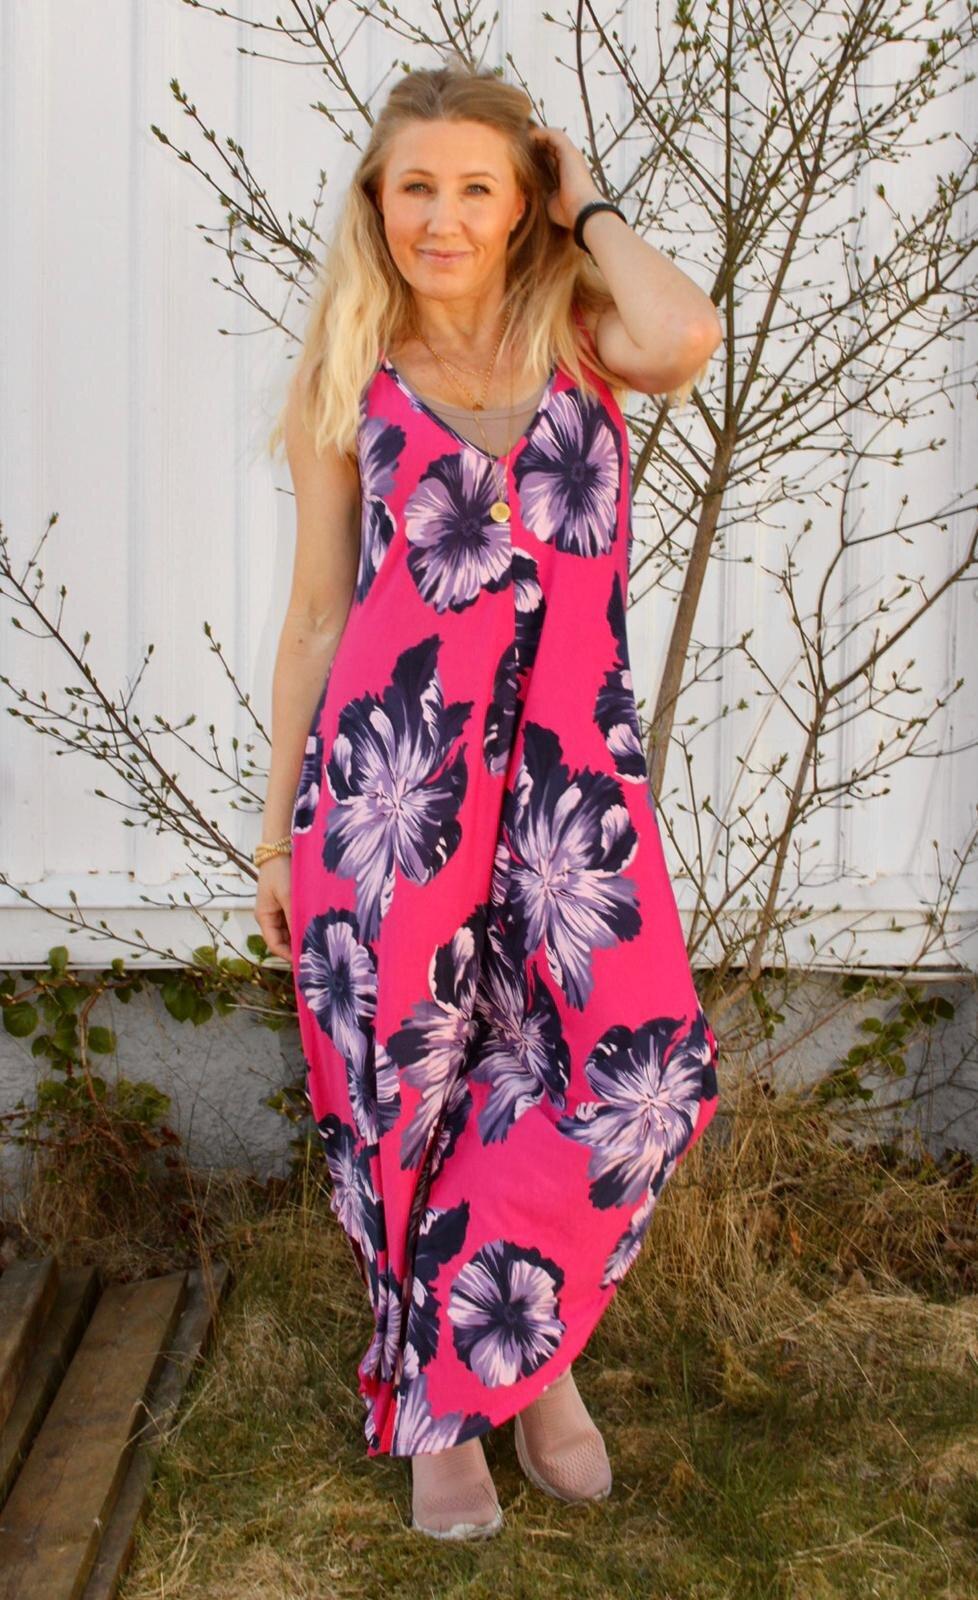 Theodora Jumpsuit - Store blomster - Cerise